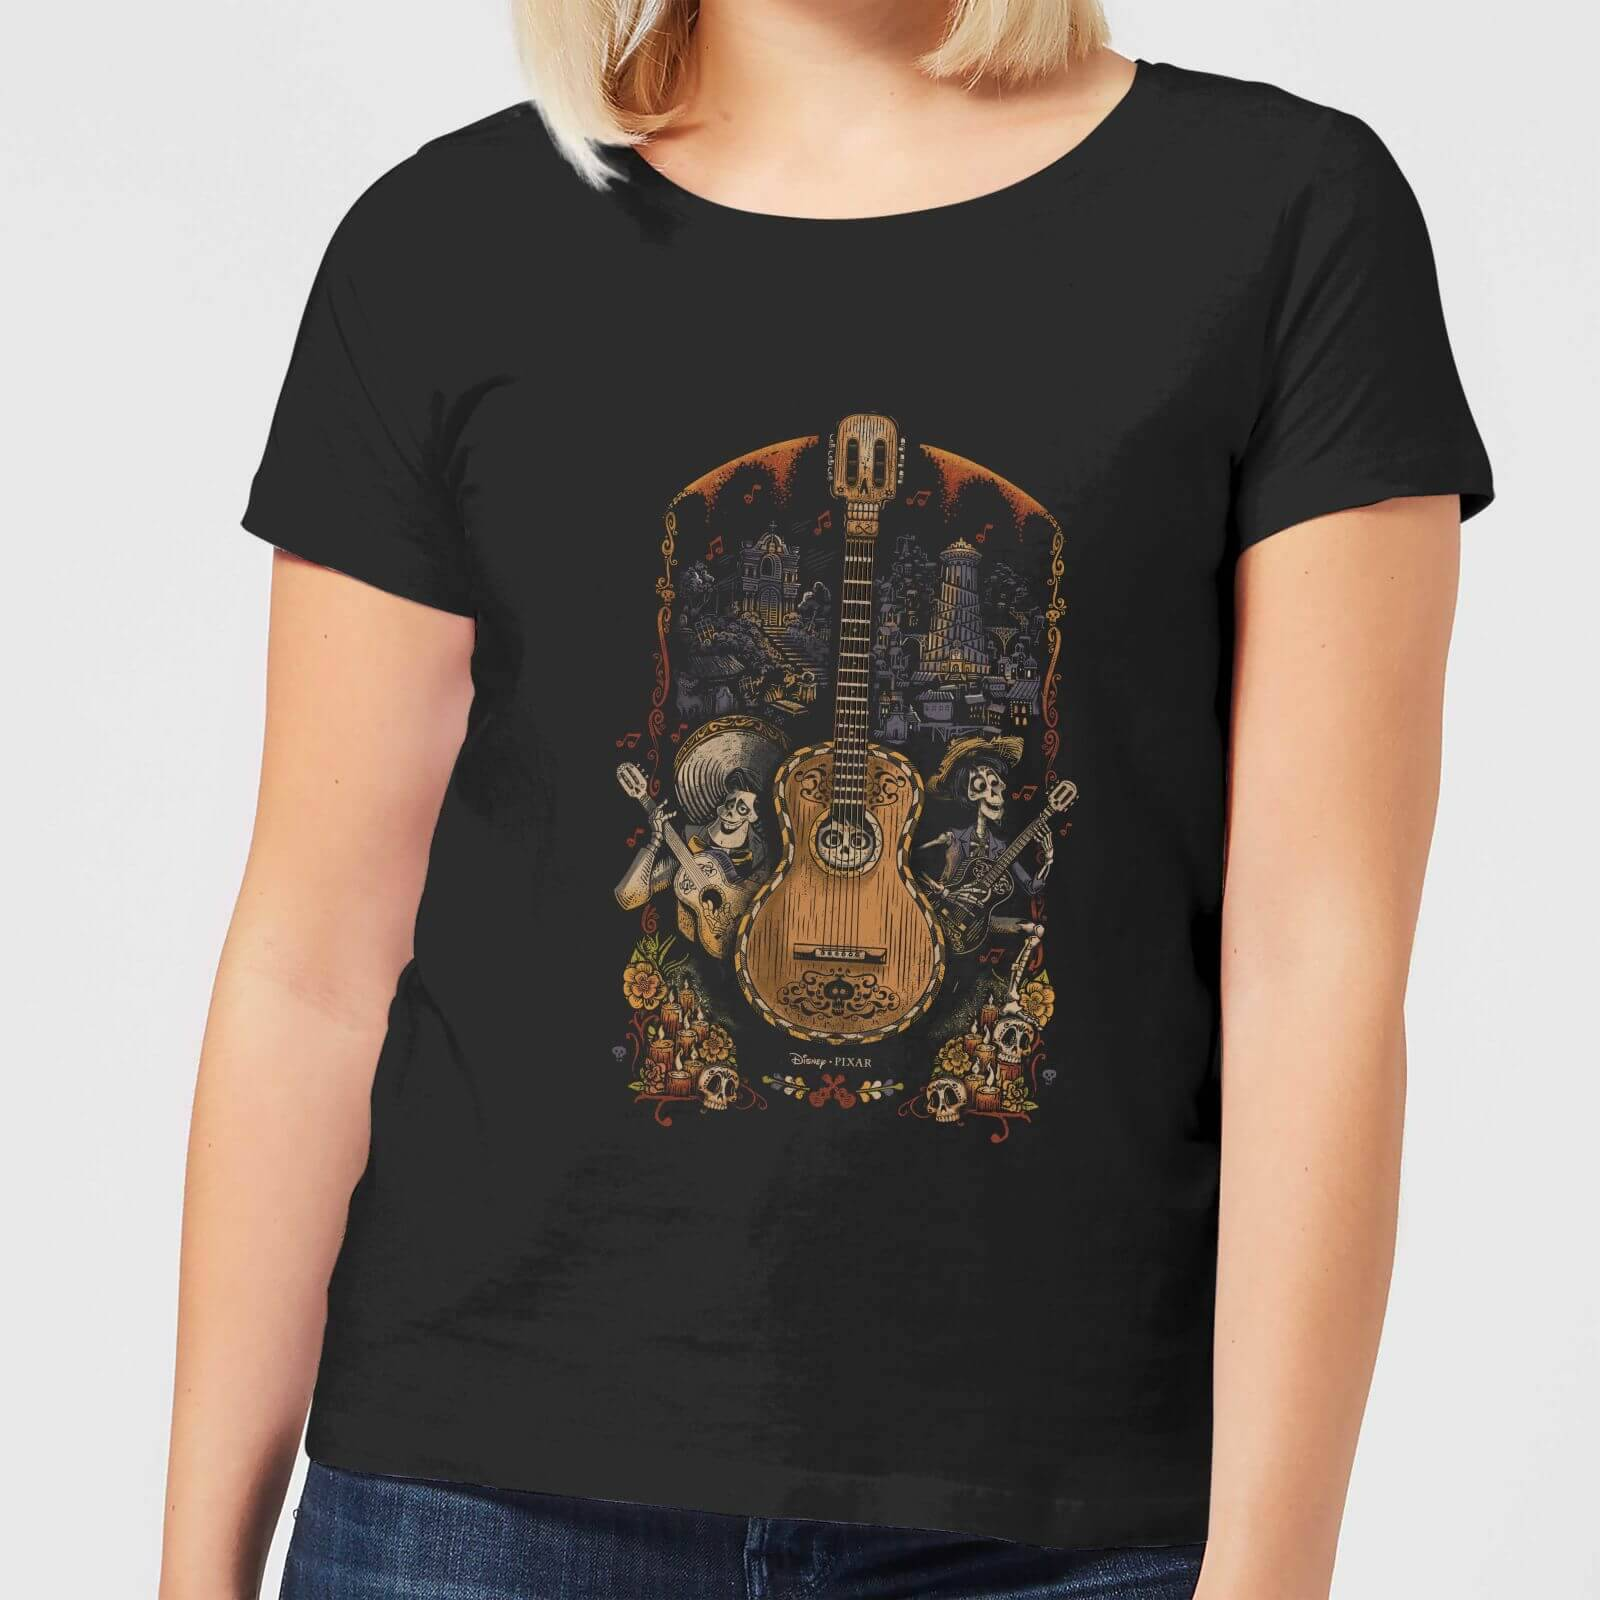 Disney Coco Guitar Poster Women's T-Shirt - Black - XL - Black